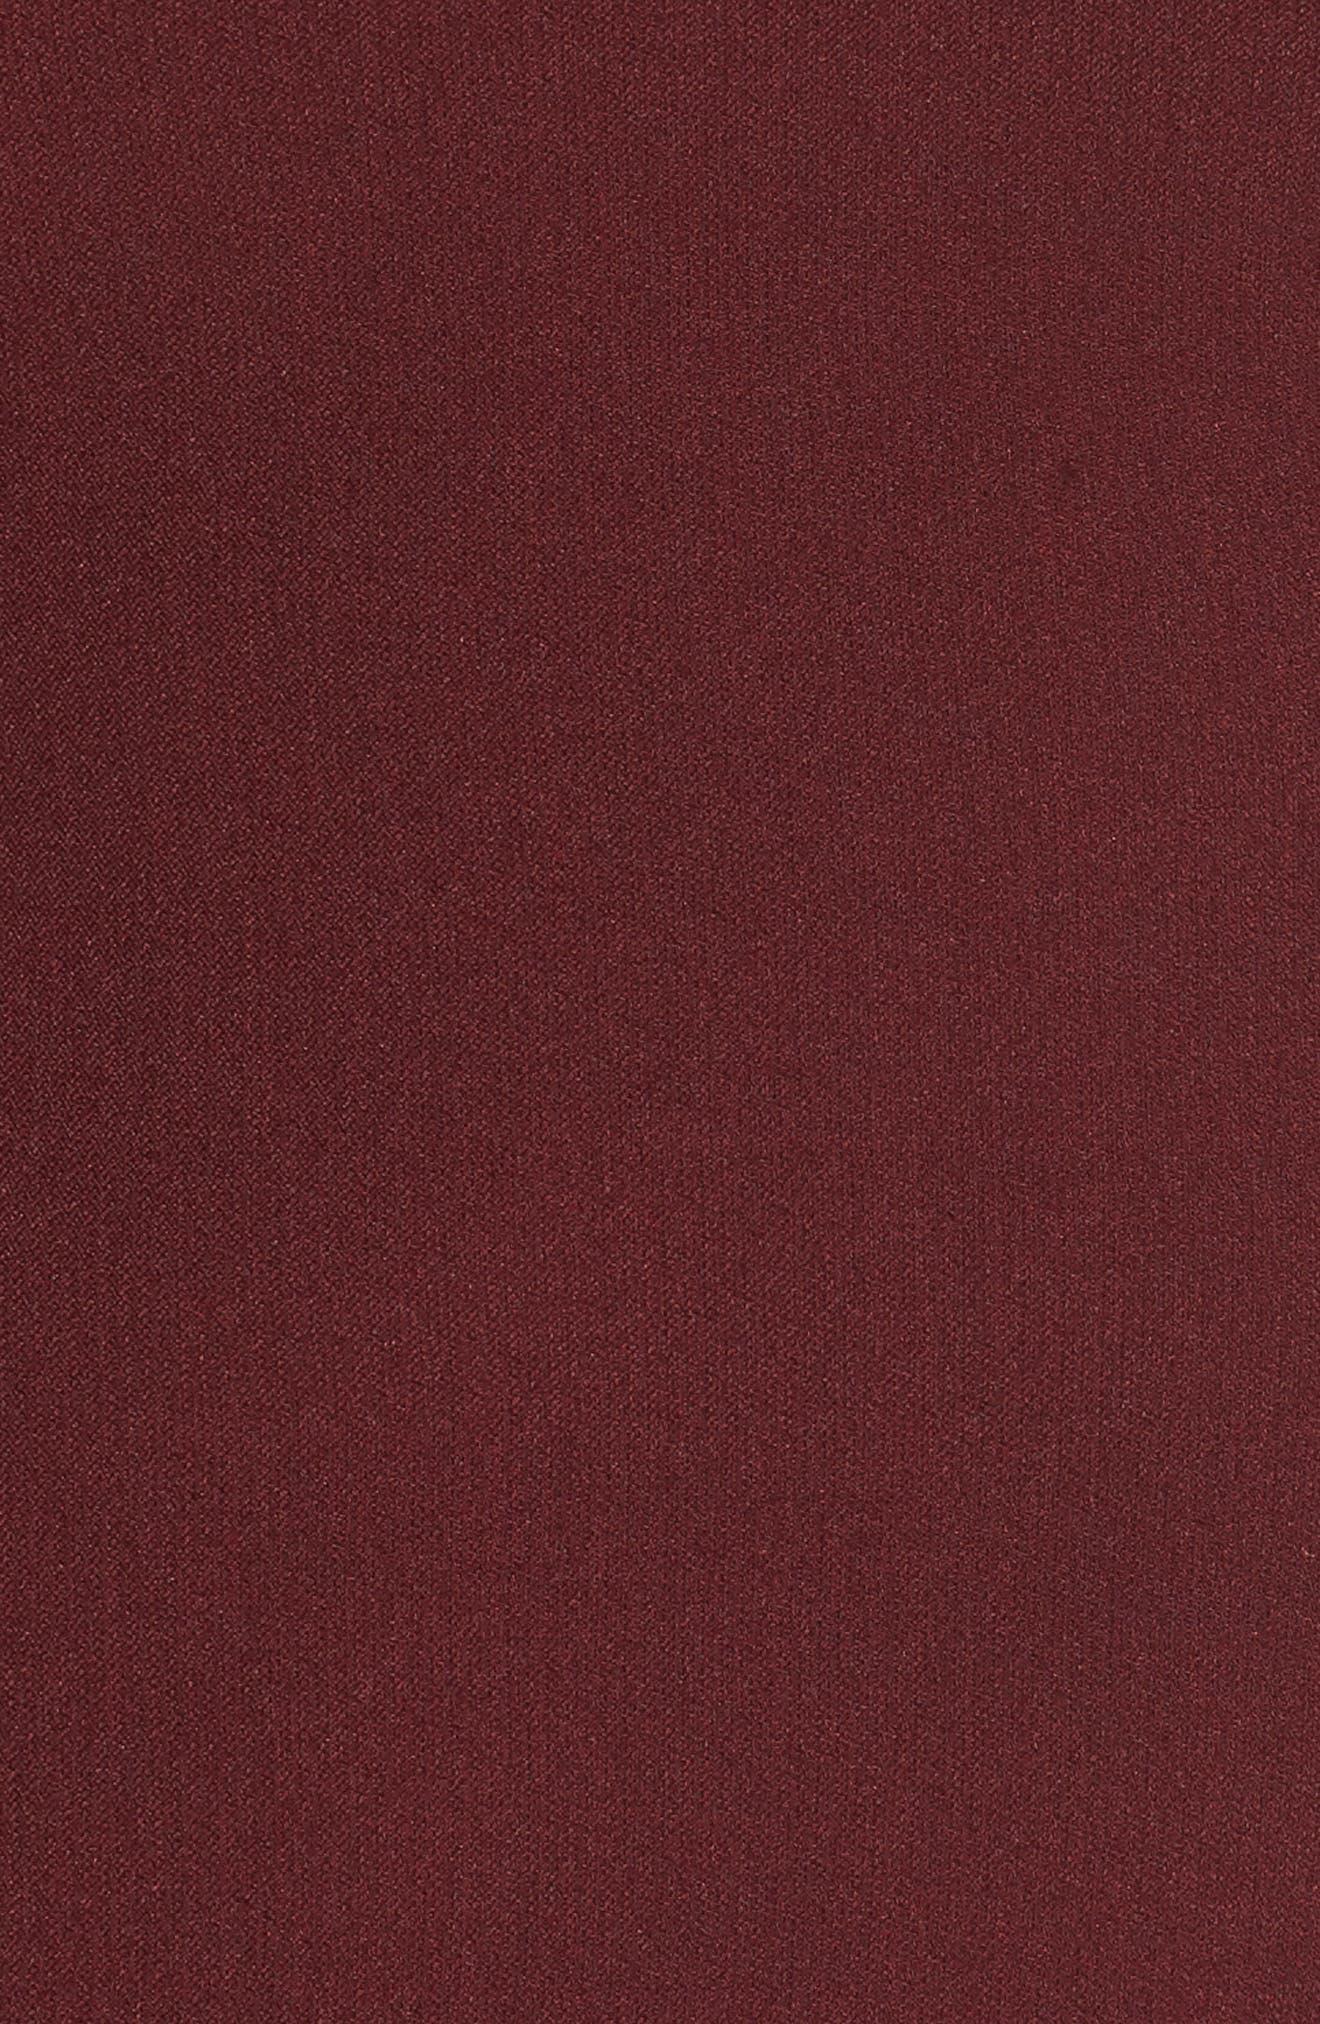 Scalloped Crepe Sheath Dress,                             Alternate thumbnail 5, color,                             Marsala